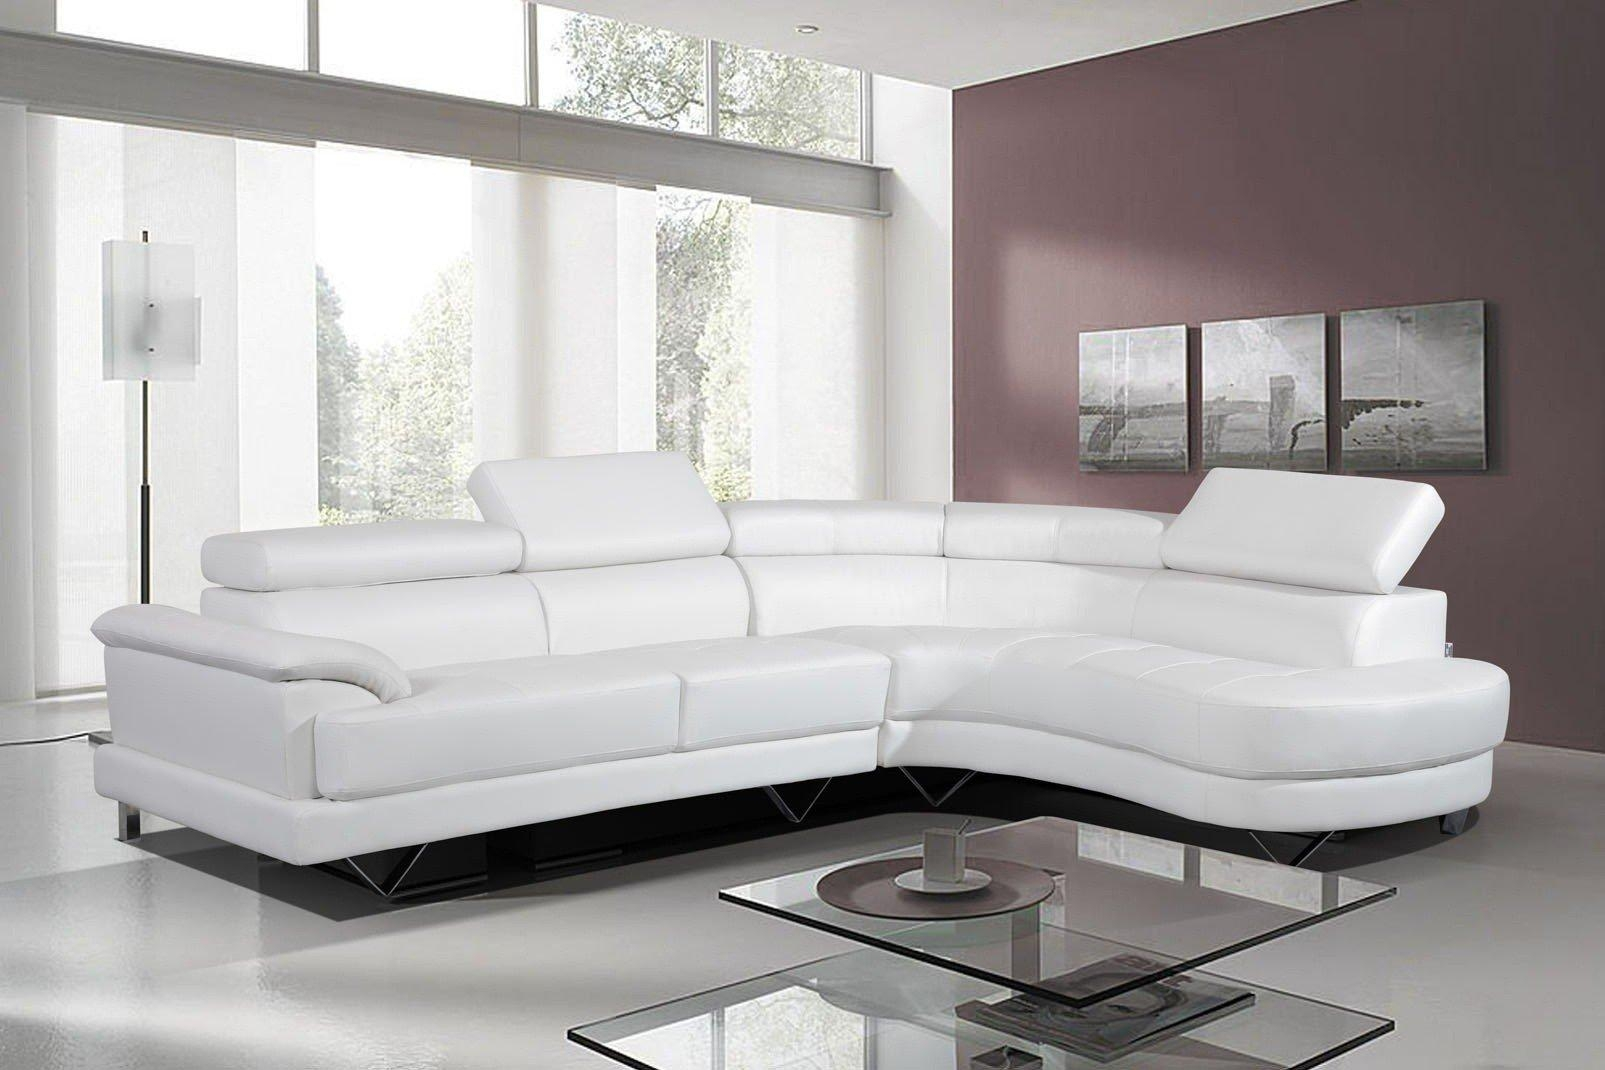 Leather Corner Sofa Ebay | Tehranmix Decoration Inside White Leather Corner Sofa (View 2 of 20)